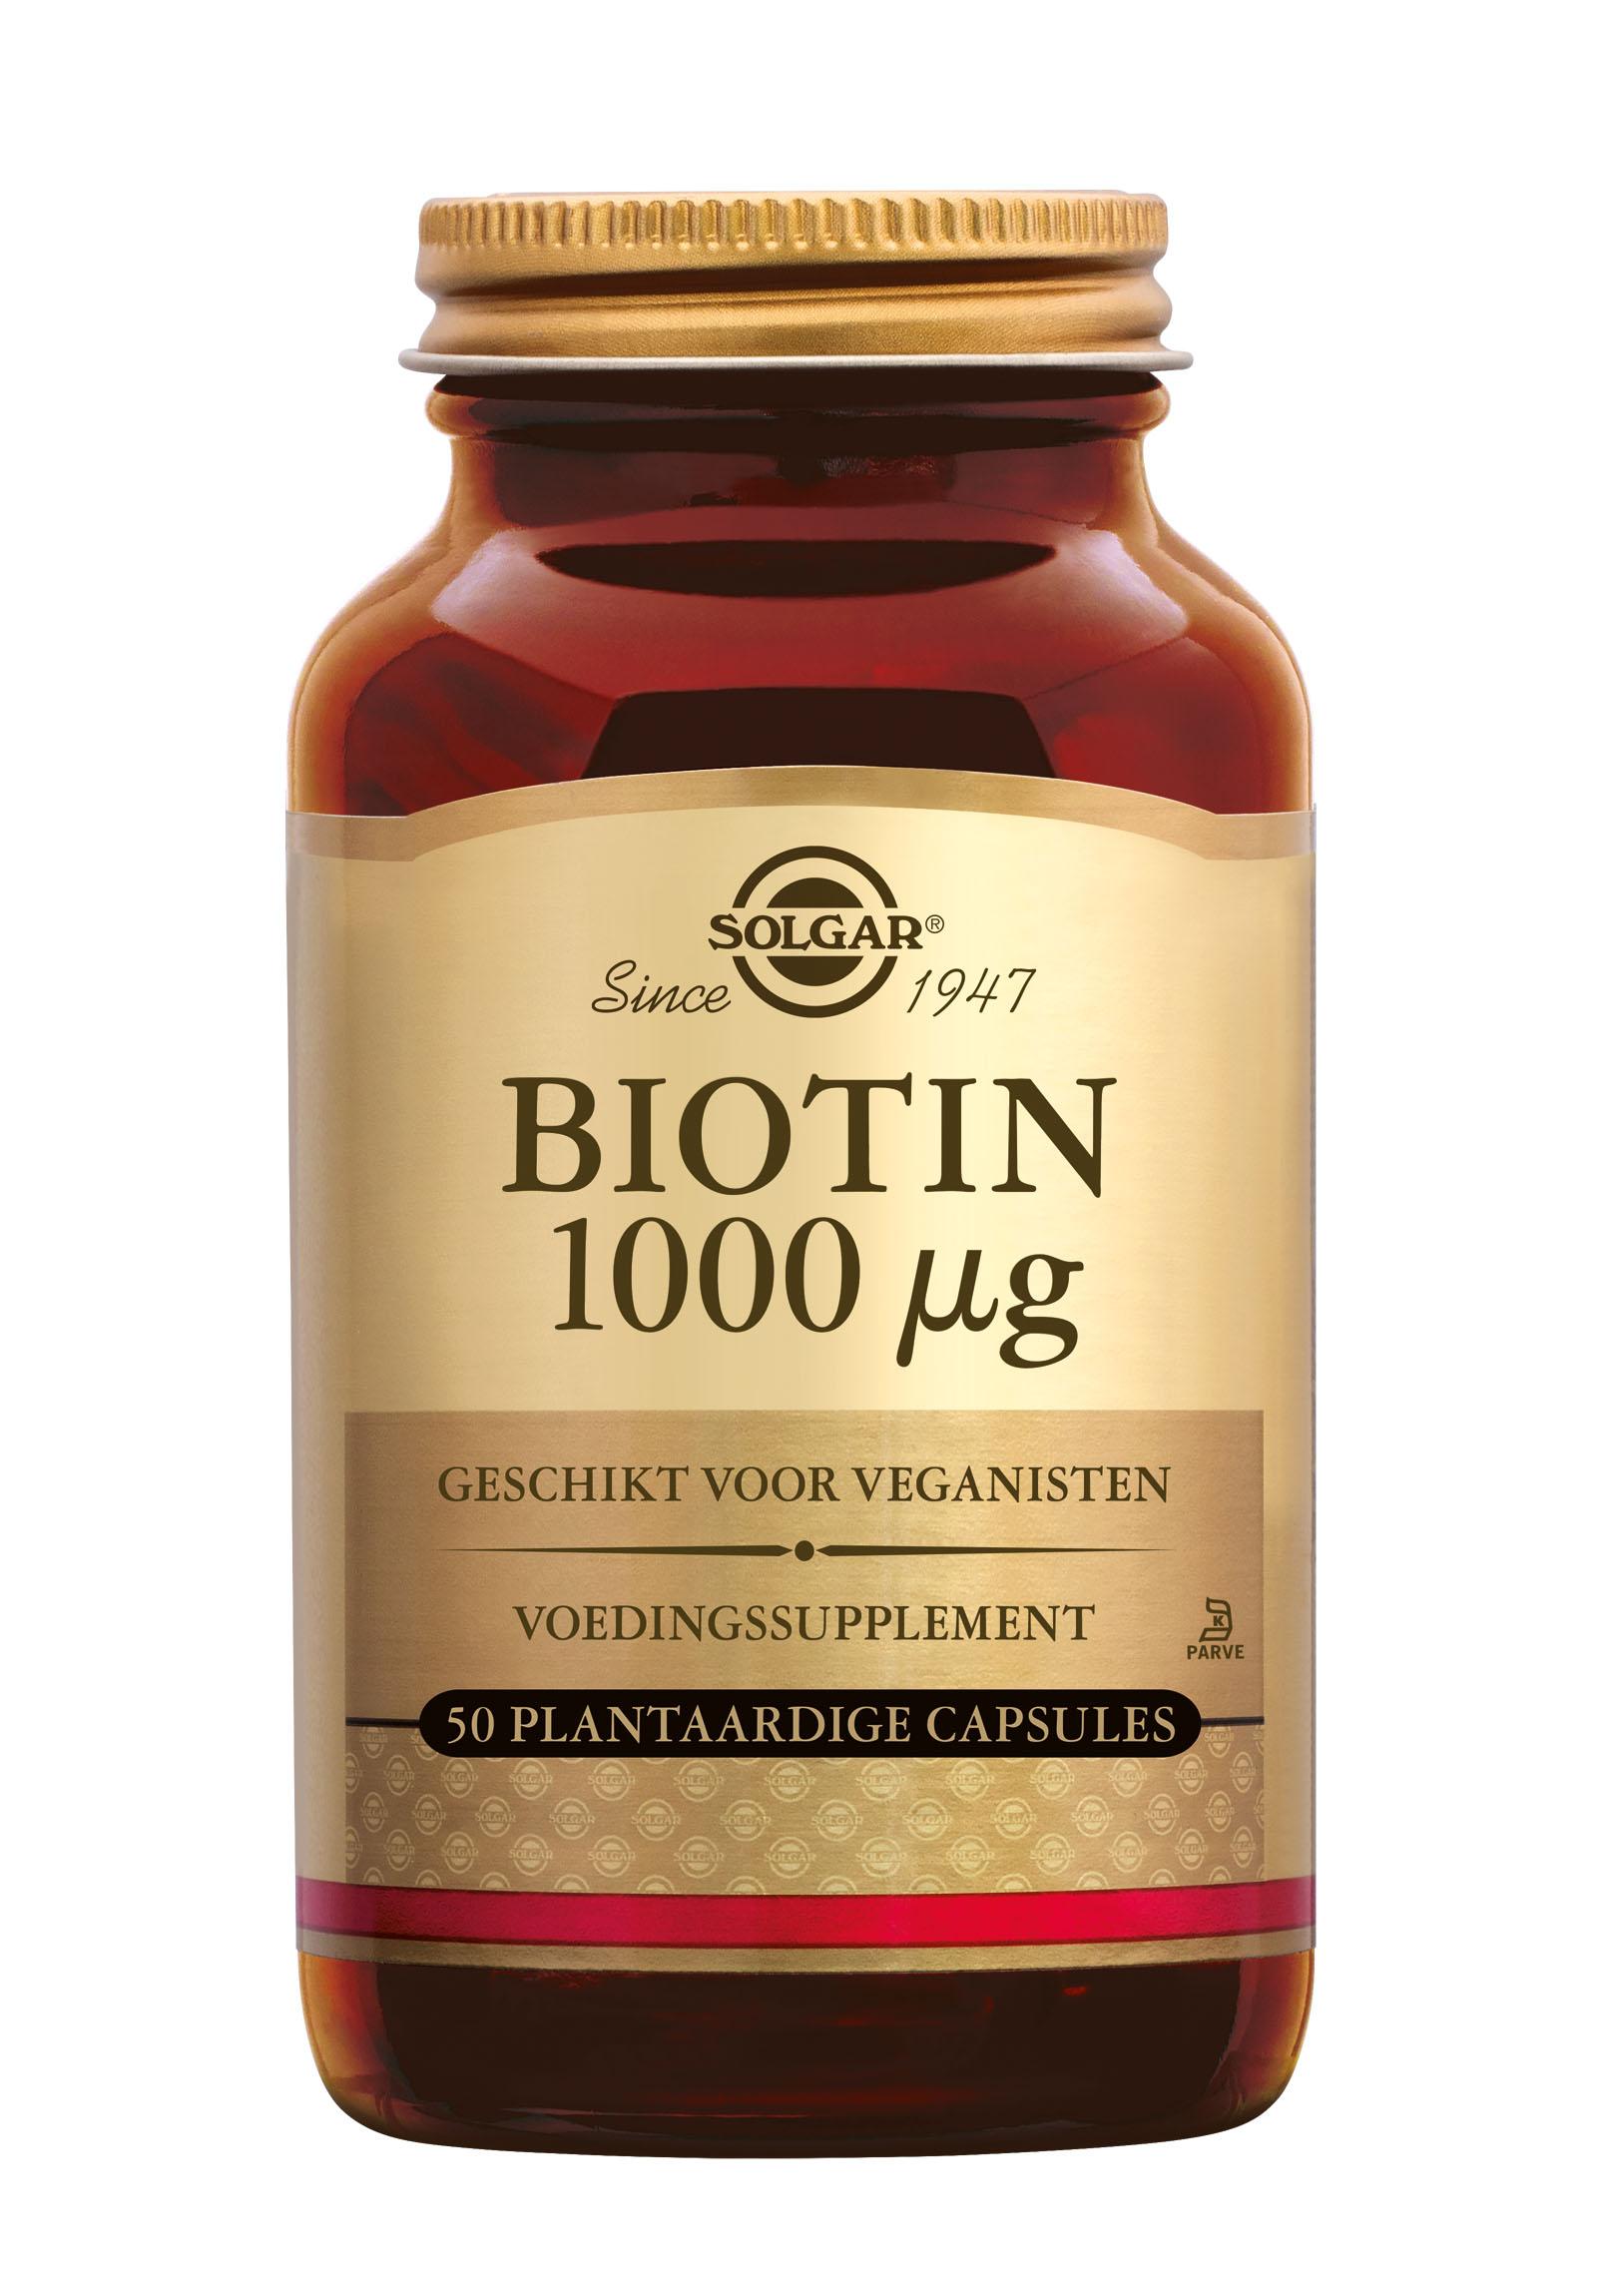 Biotin 1000 mcg